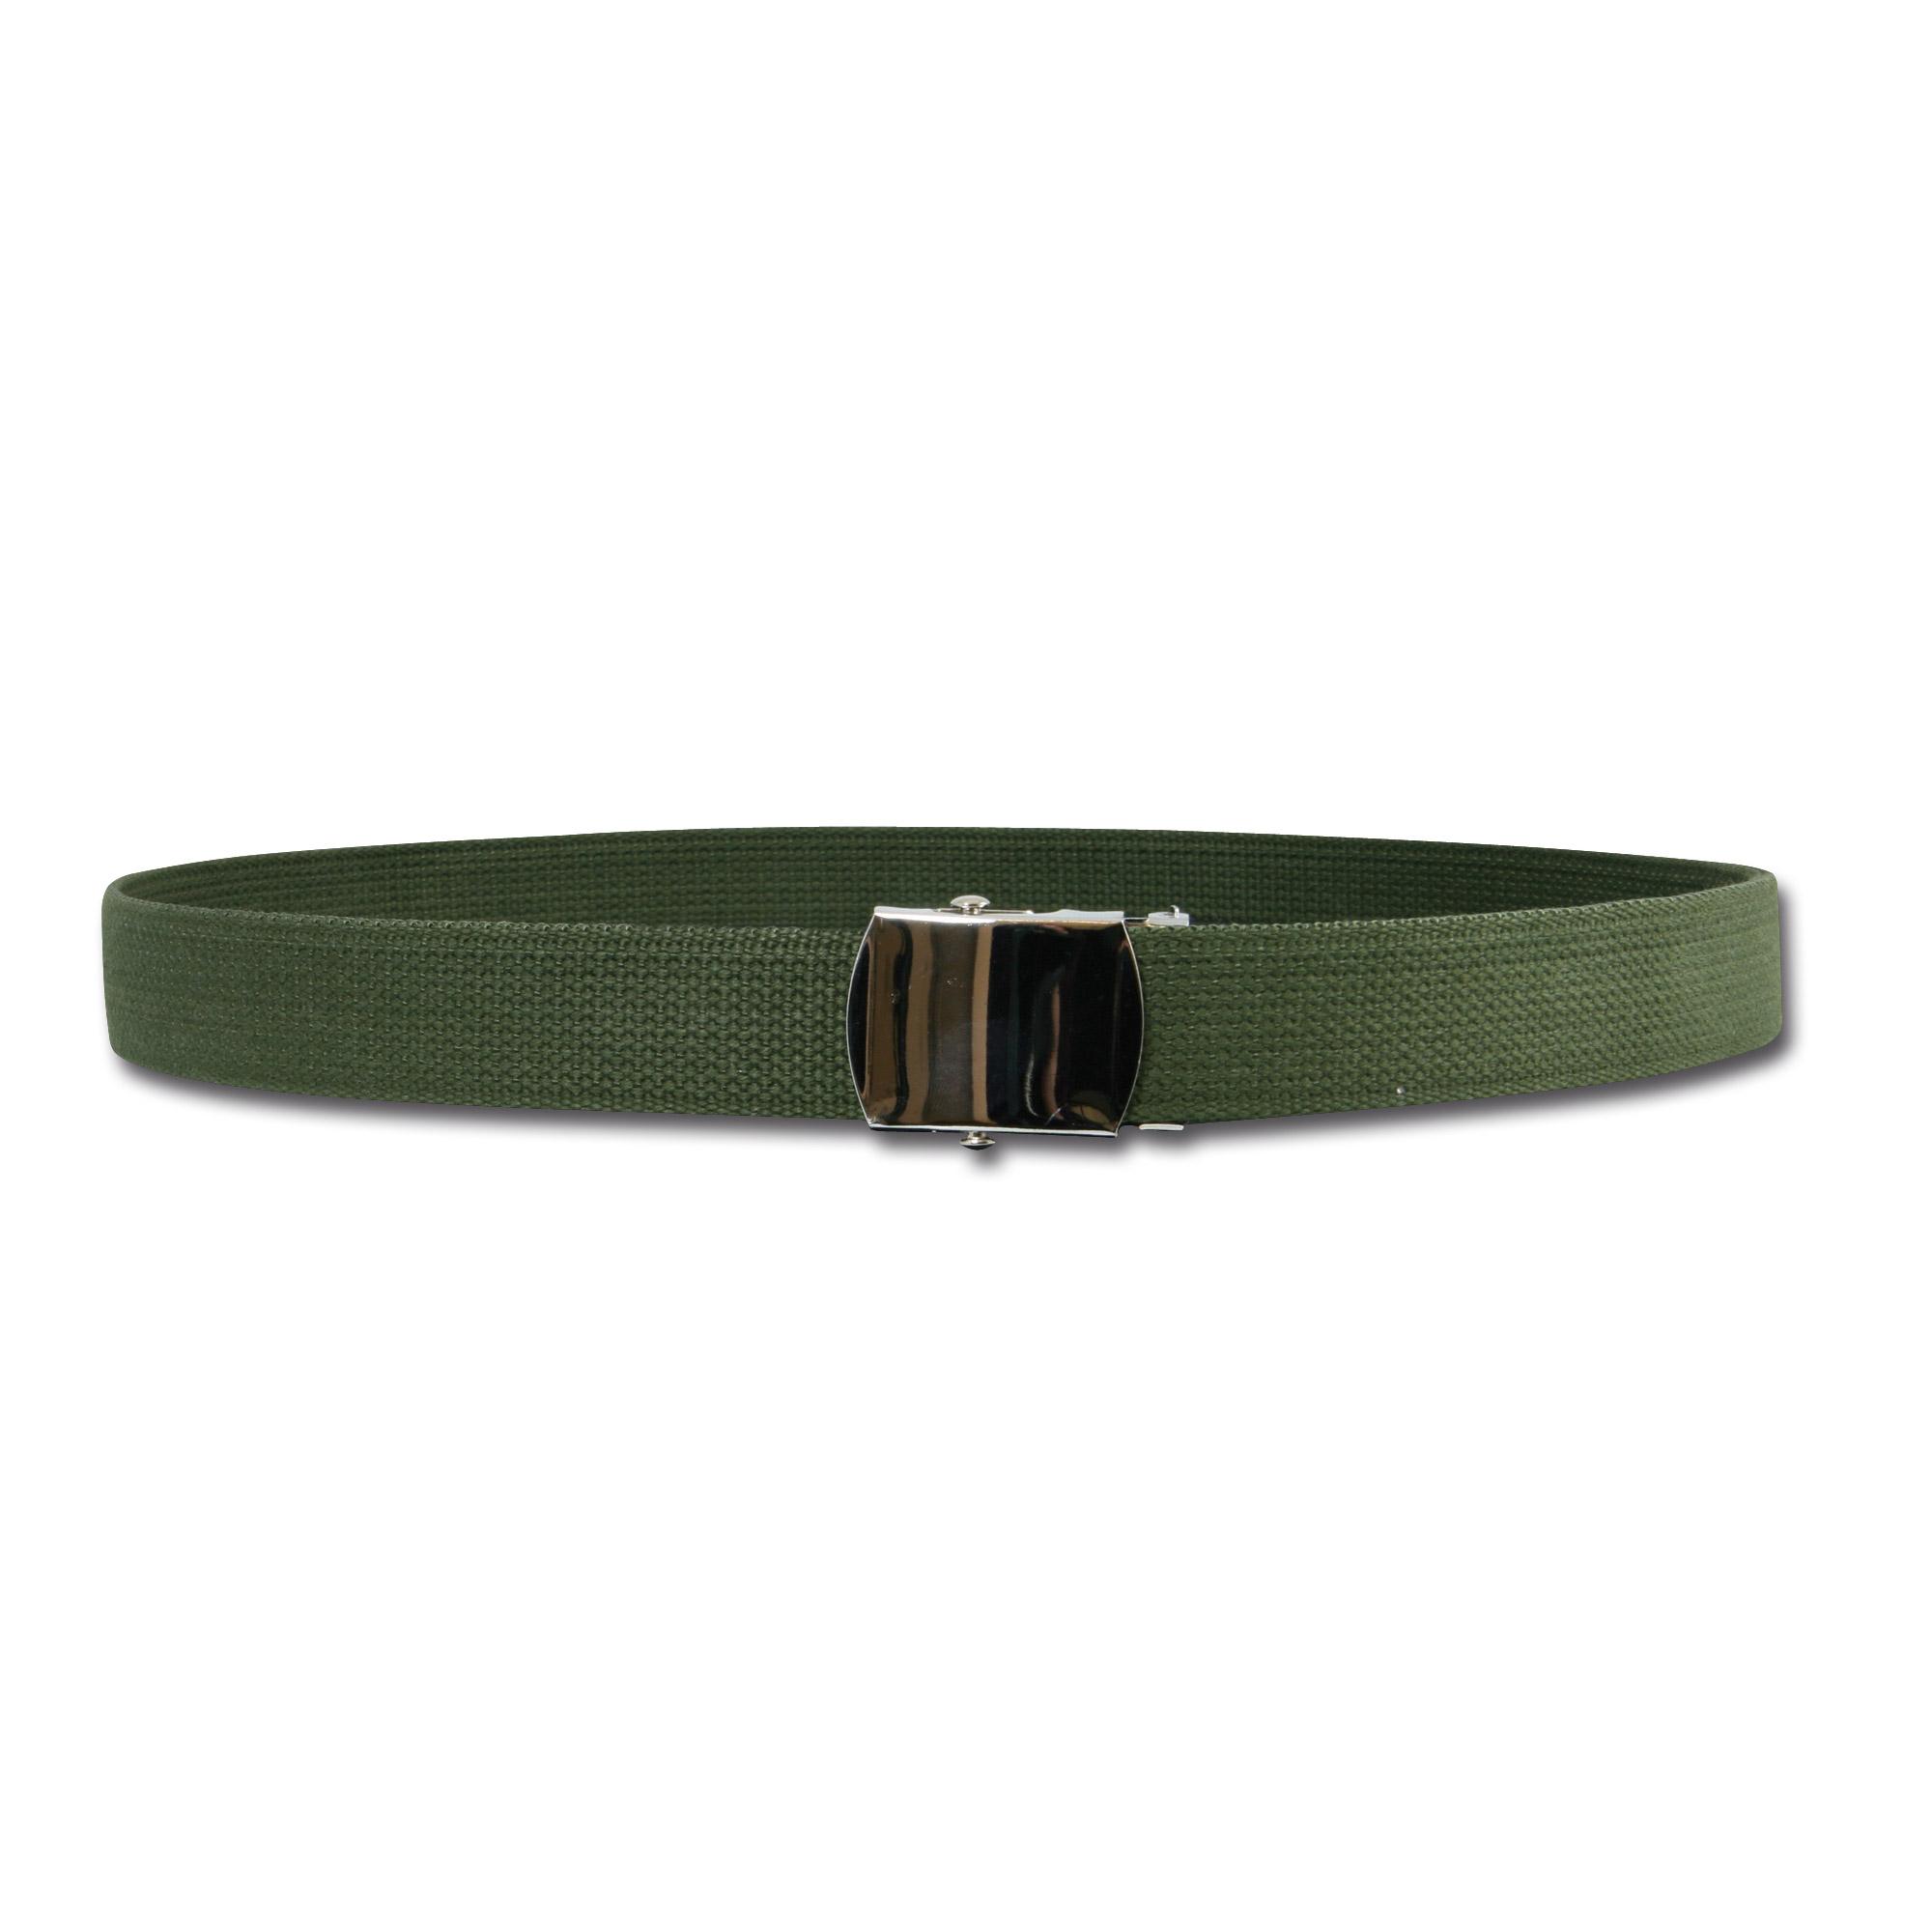 Cintura con fibbia regolabile, verde oliva